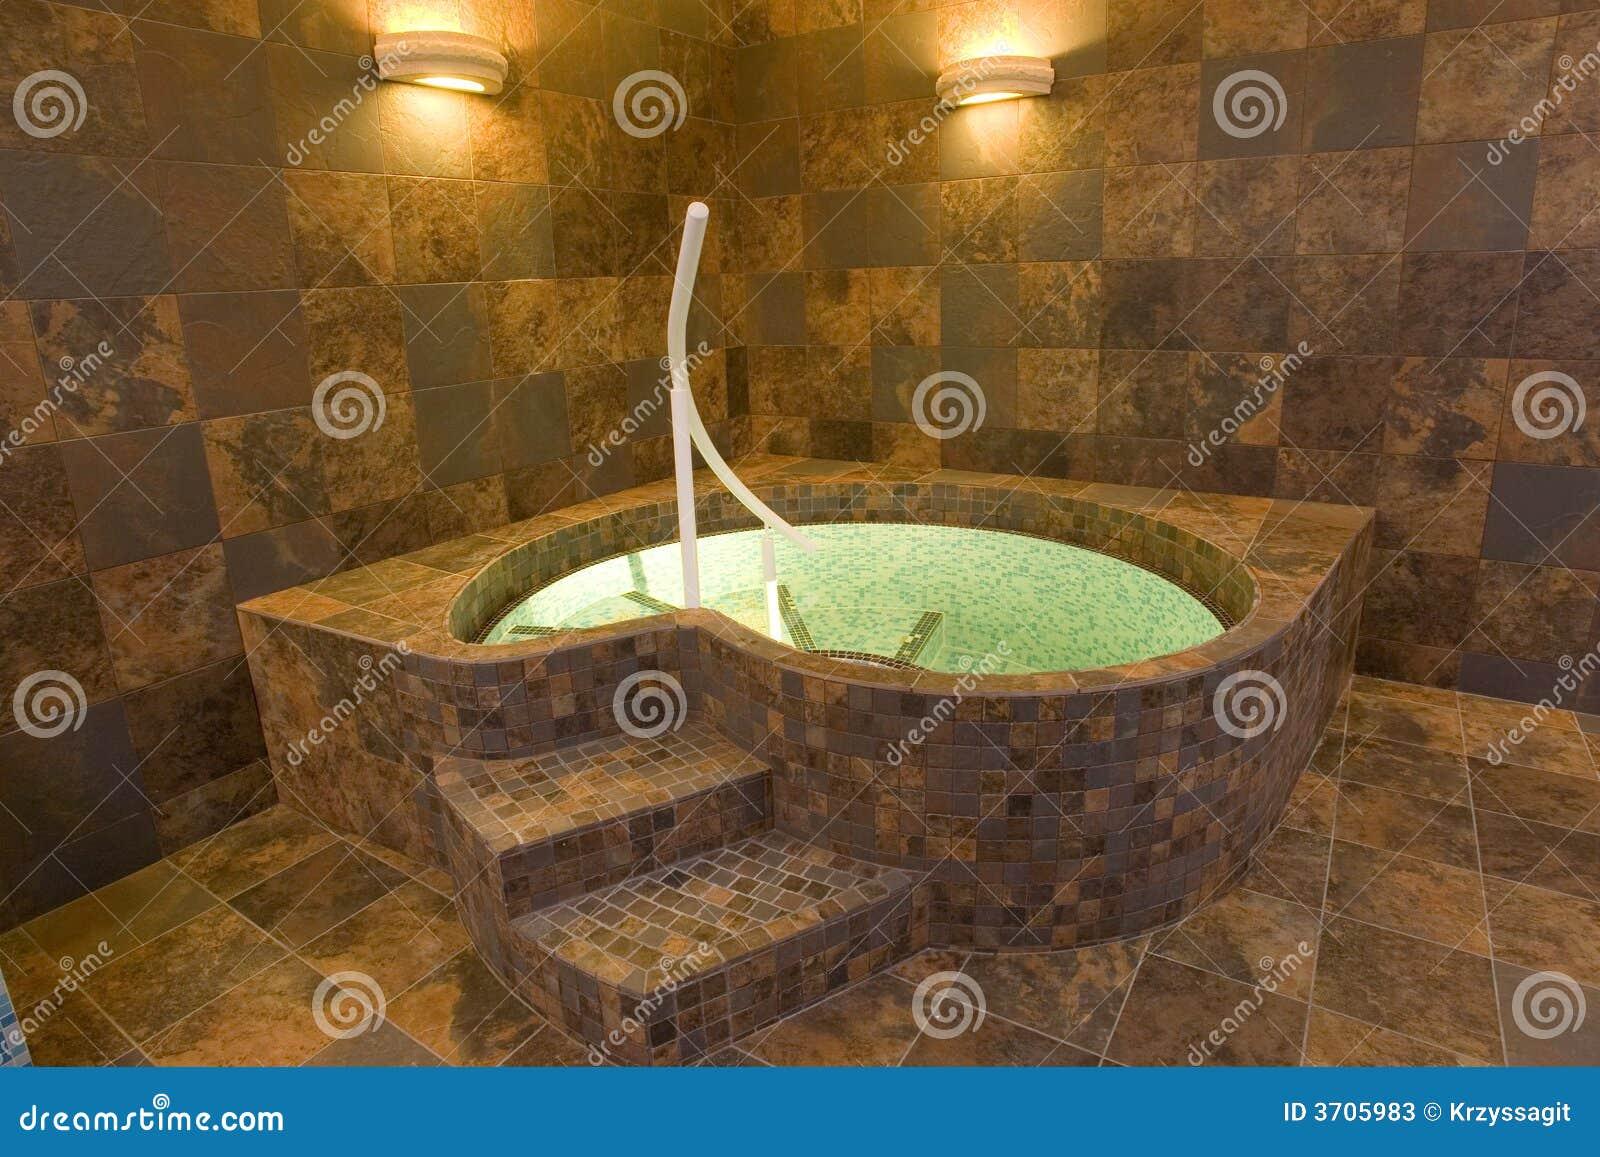 Indoor jacuzzi pool stock image. Image of decor, posh - 3705983